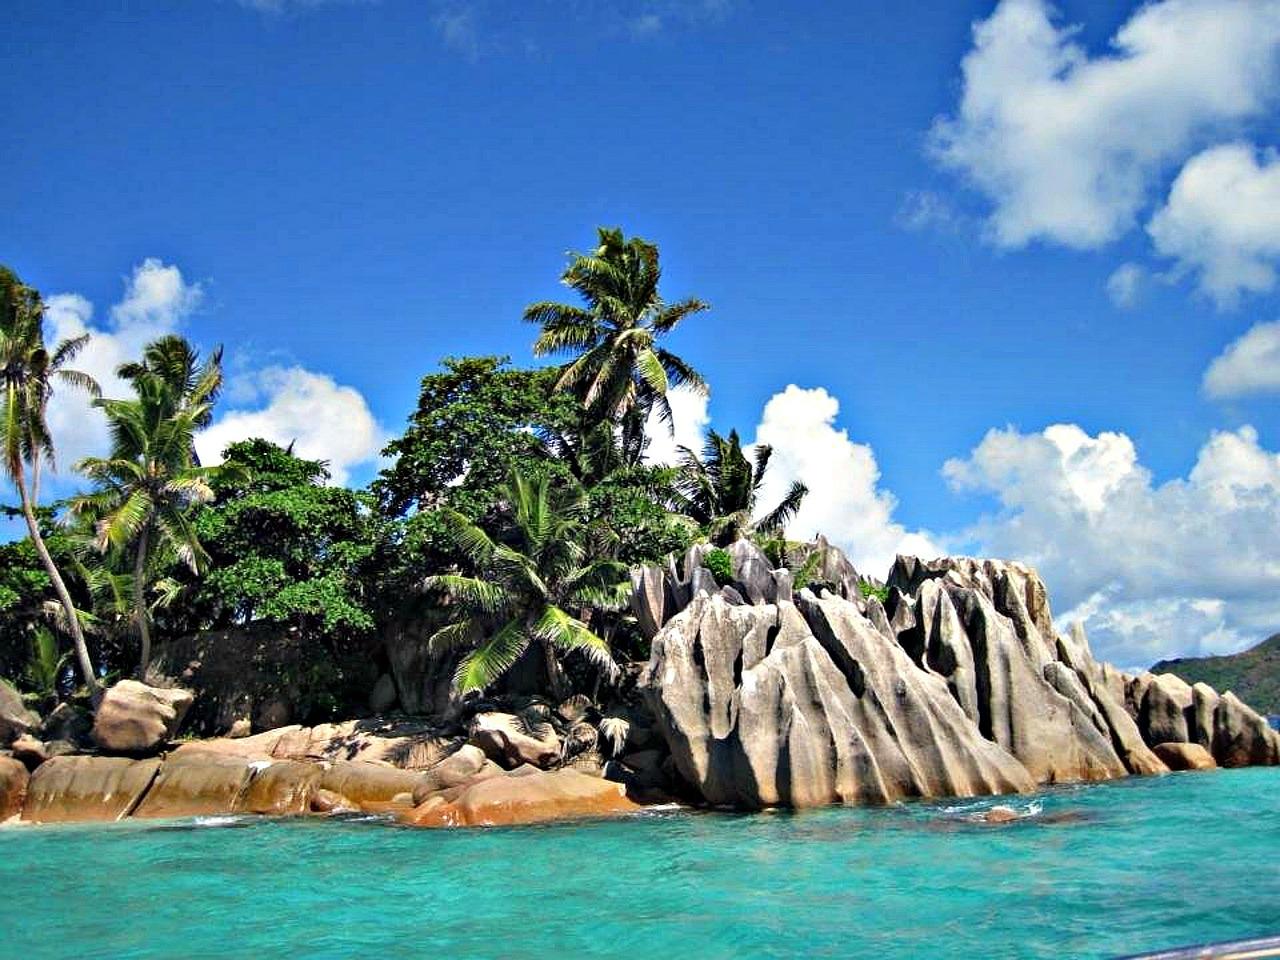 seychelles-215253_1280